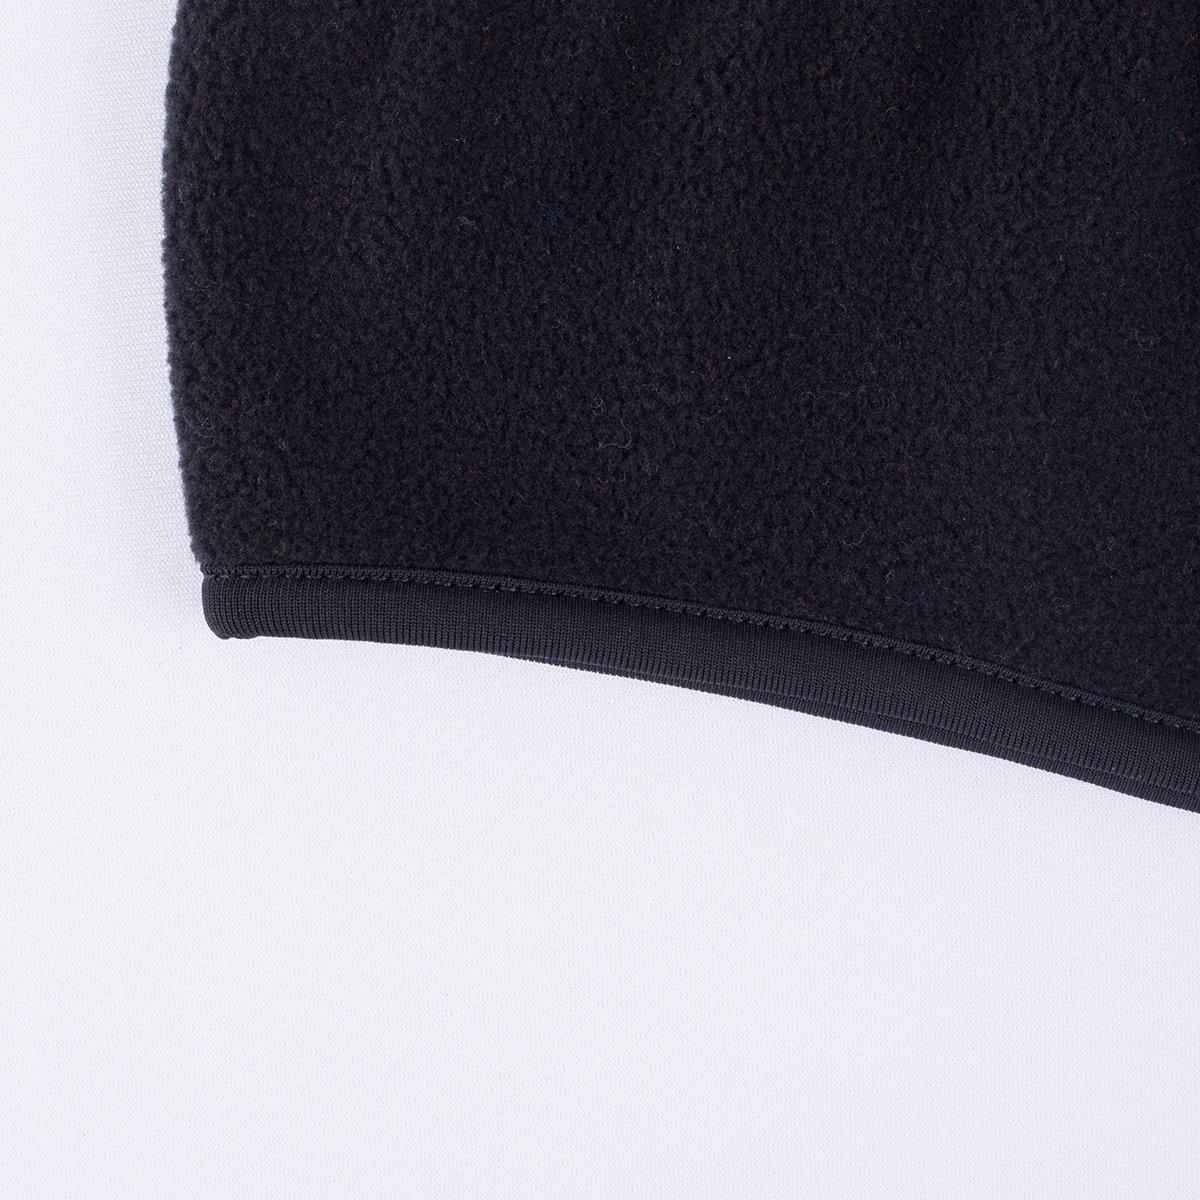 NANSI Headband Ear Warmer Winter Running Headband Sweatband Sports Non Slip Earmuff for Girls Women Ear Band Men Fleece Headband Ear Cover Muffs for Jogging Cycling Riding Motorcycle Yoga